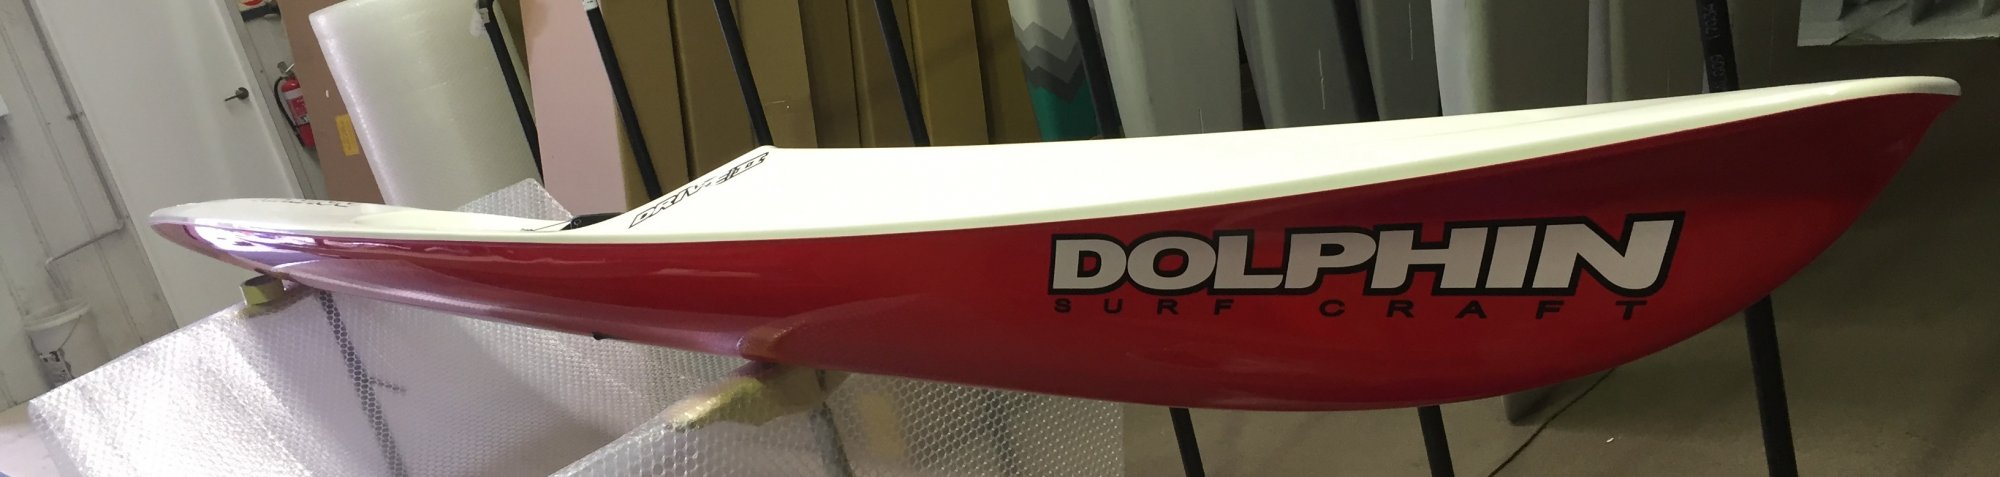 Dolphin Adjustable Drive II Surf Ski 19' - 976